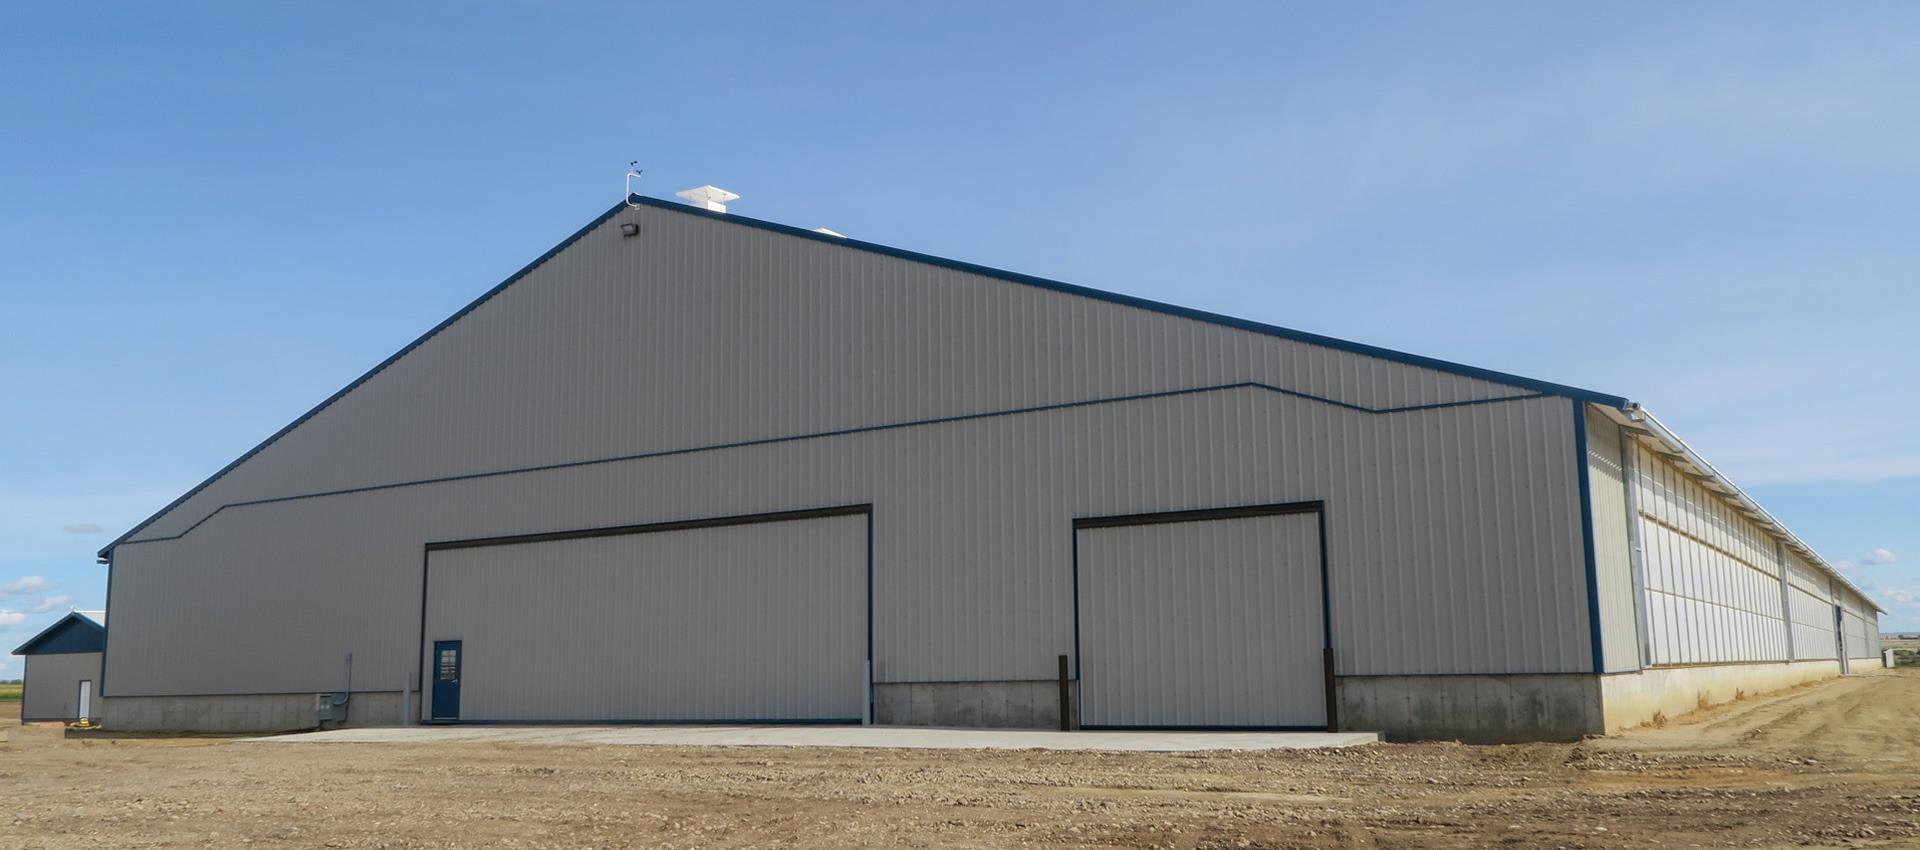 150' x 500' Beef Housing